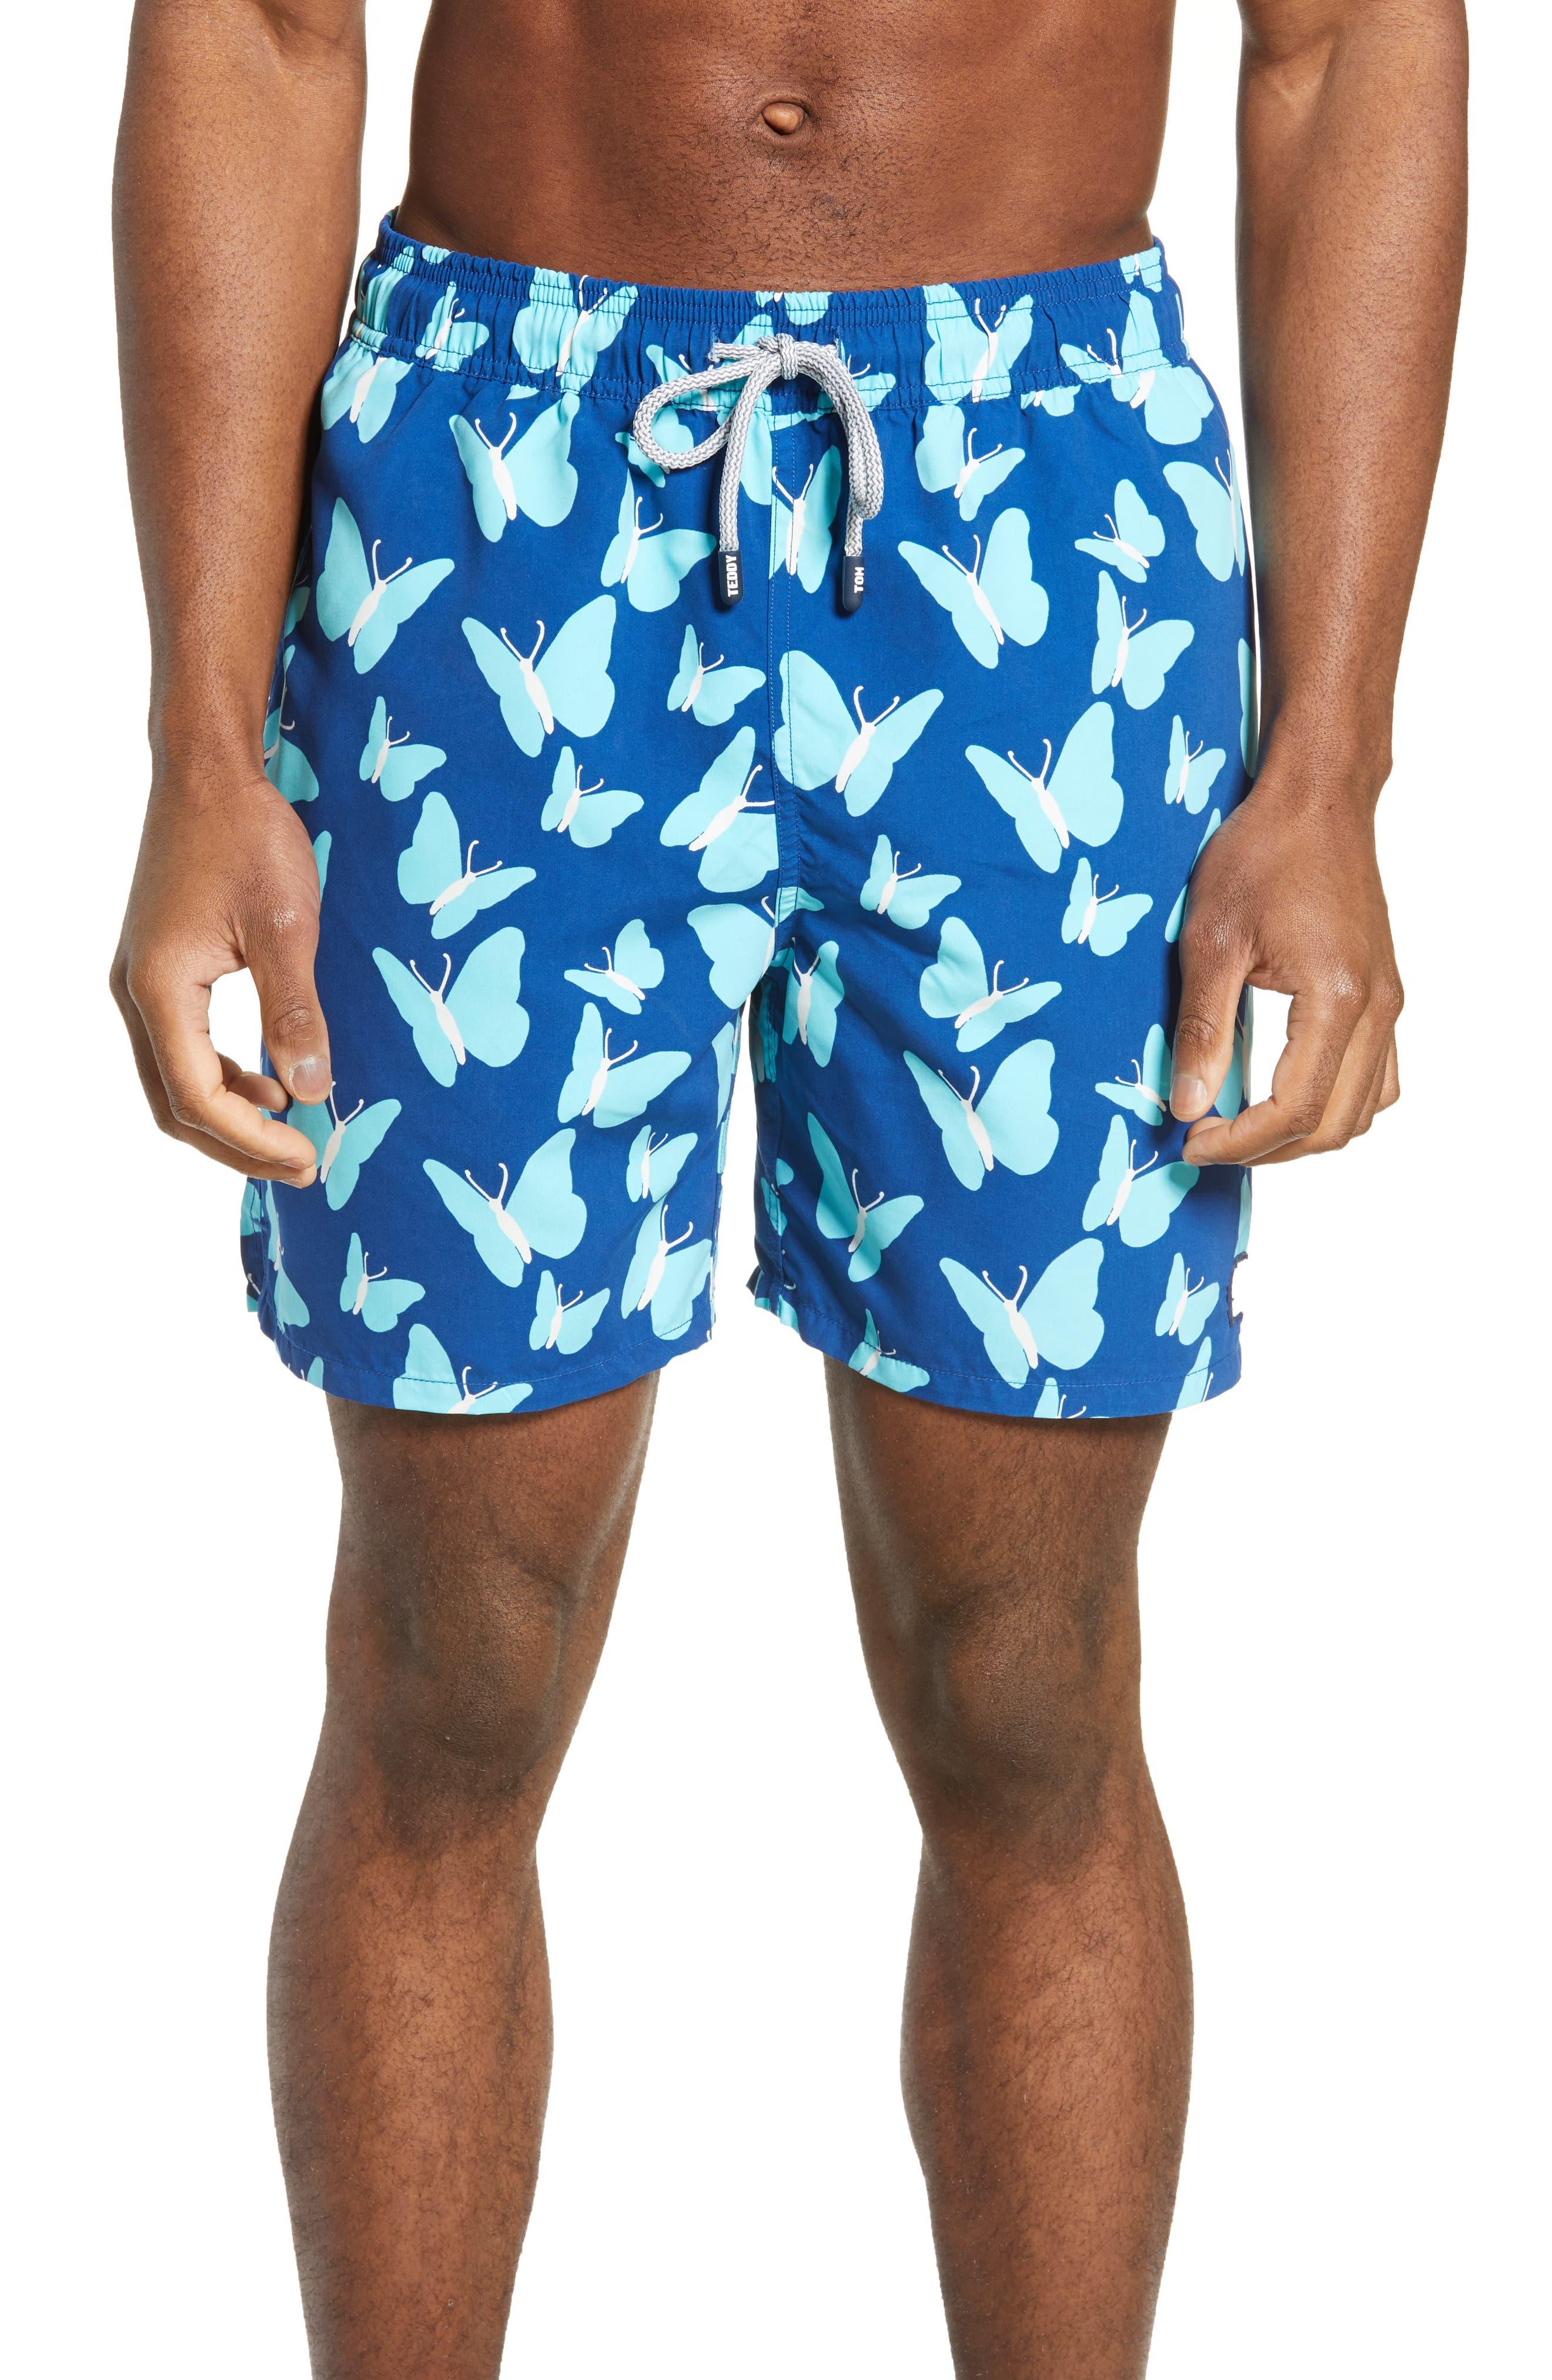 Tom & Teddy Butterfly Print Swim Trunks, Blue